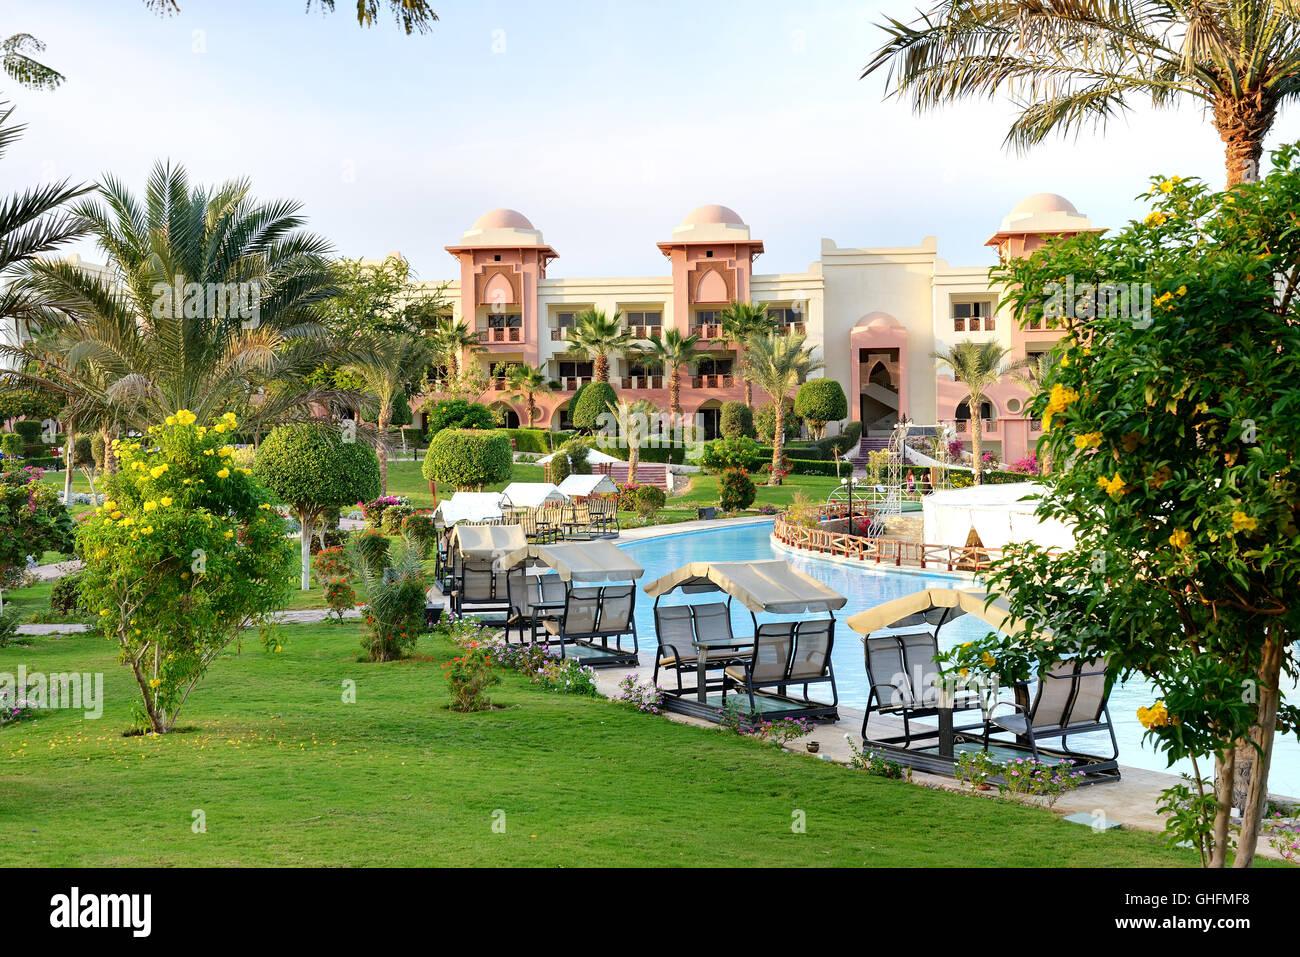 Egypt Red Sea Hurghada Swimming Pool Stock Photos & Egypt Red Sea ...